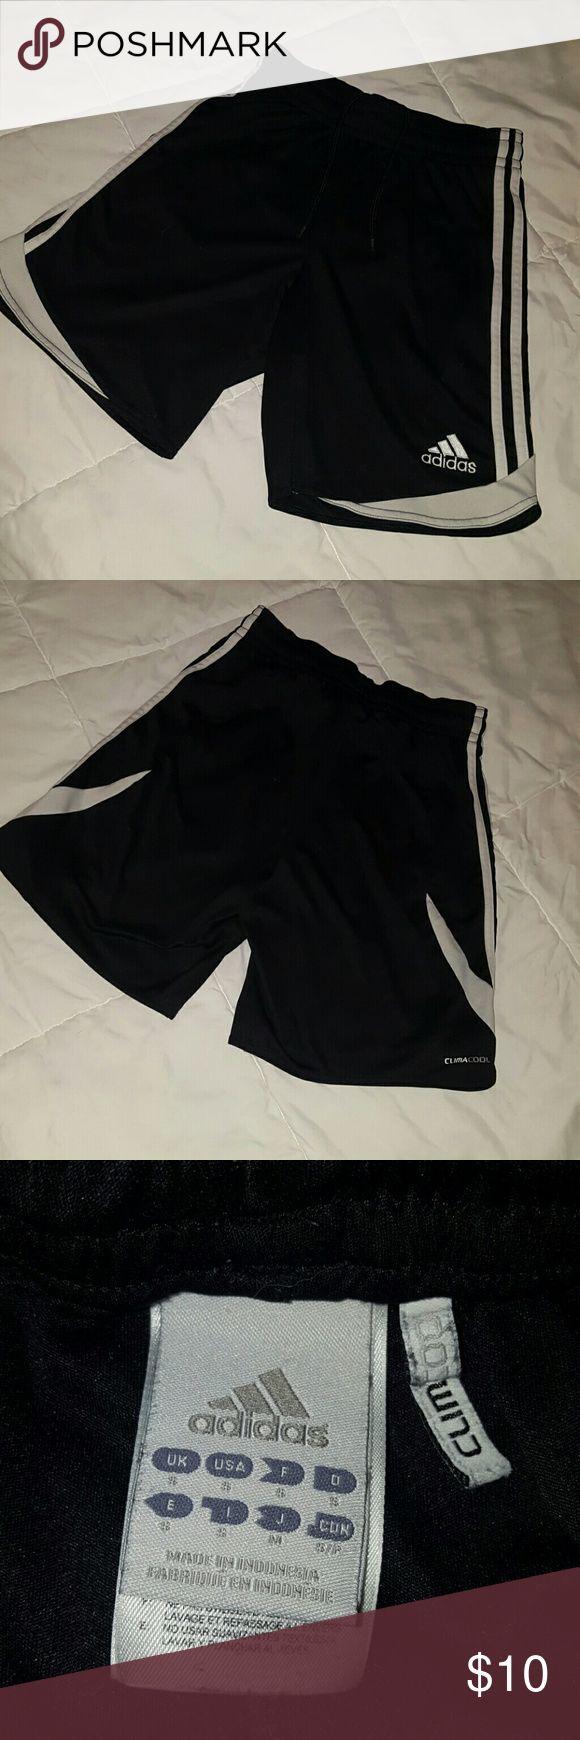 Adidas Soccer Shorts Great condition. Woman's small. Adidas Shorts